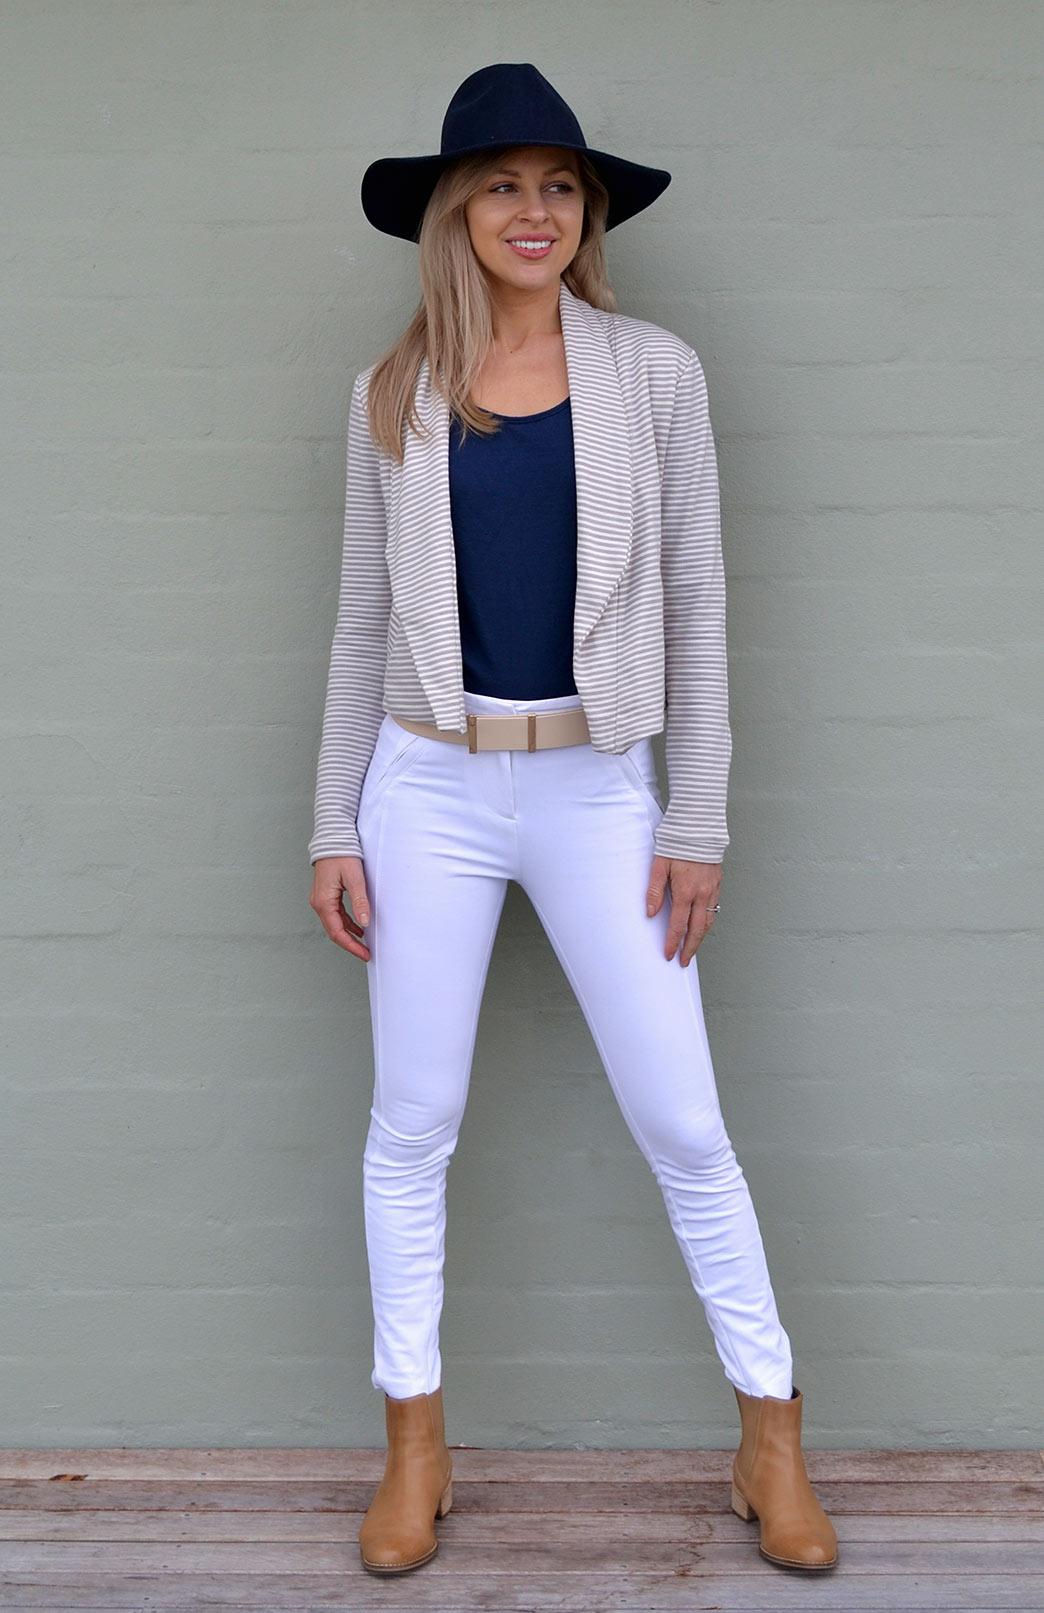 Lapel Jacket - Women's Merino Wool Organic Cotton Blend Striped Lapel Jacket - Smitten Merino Tasmania Australia